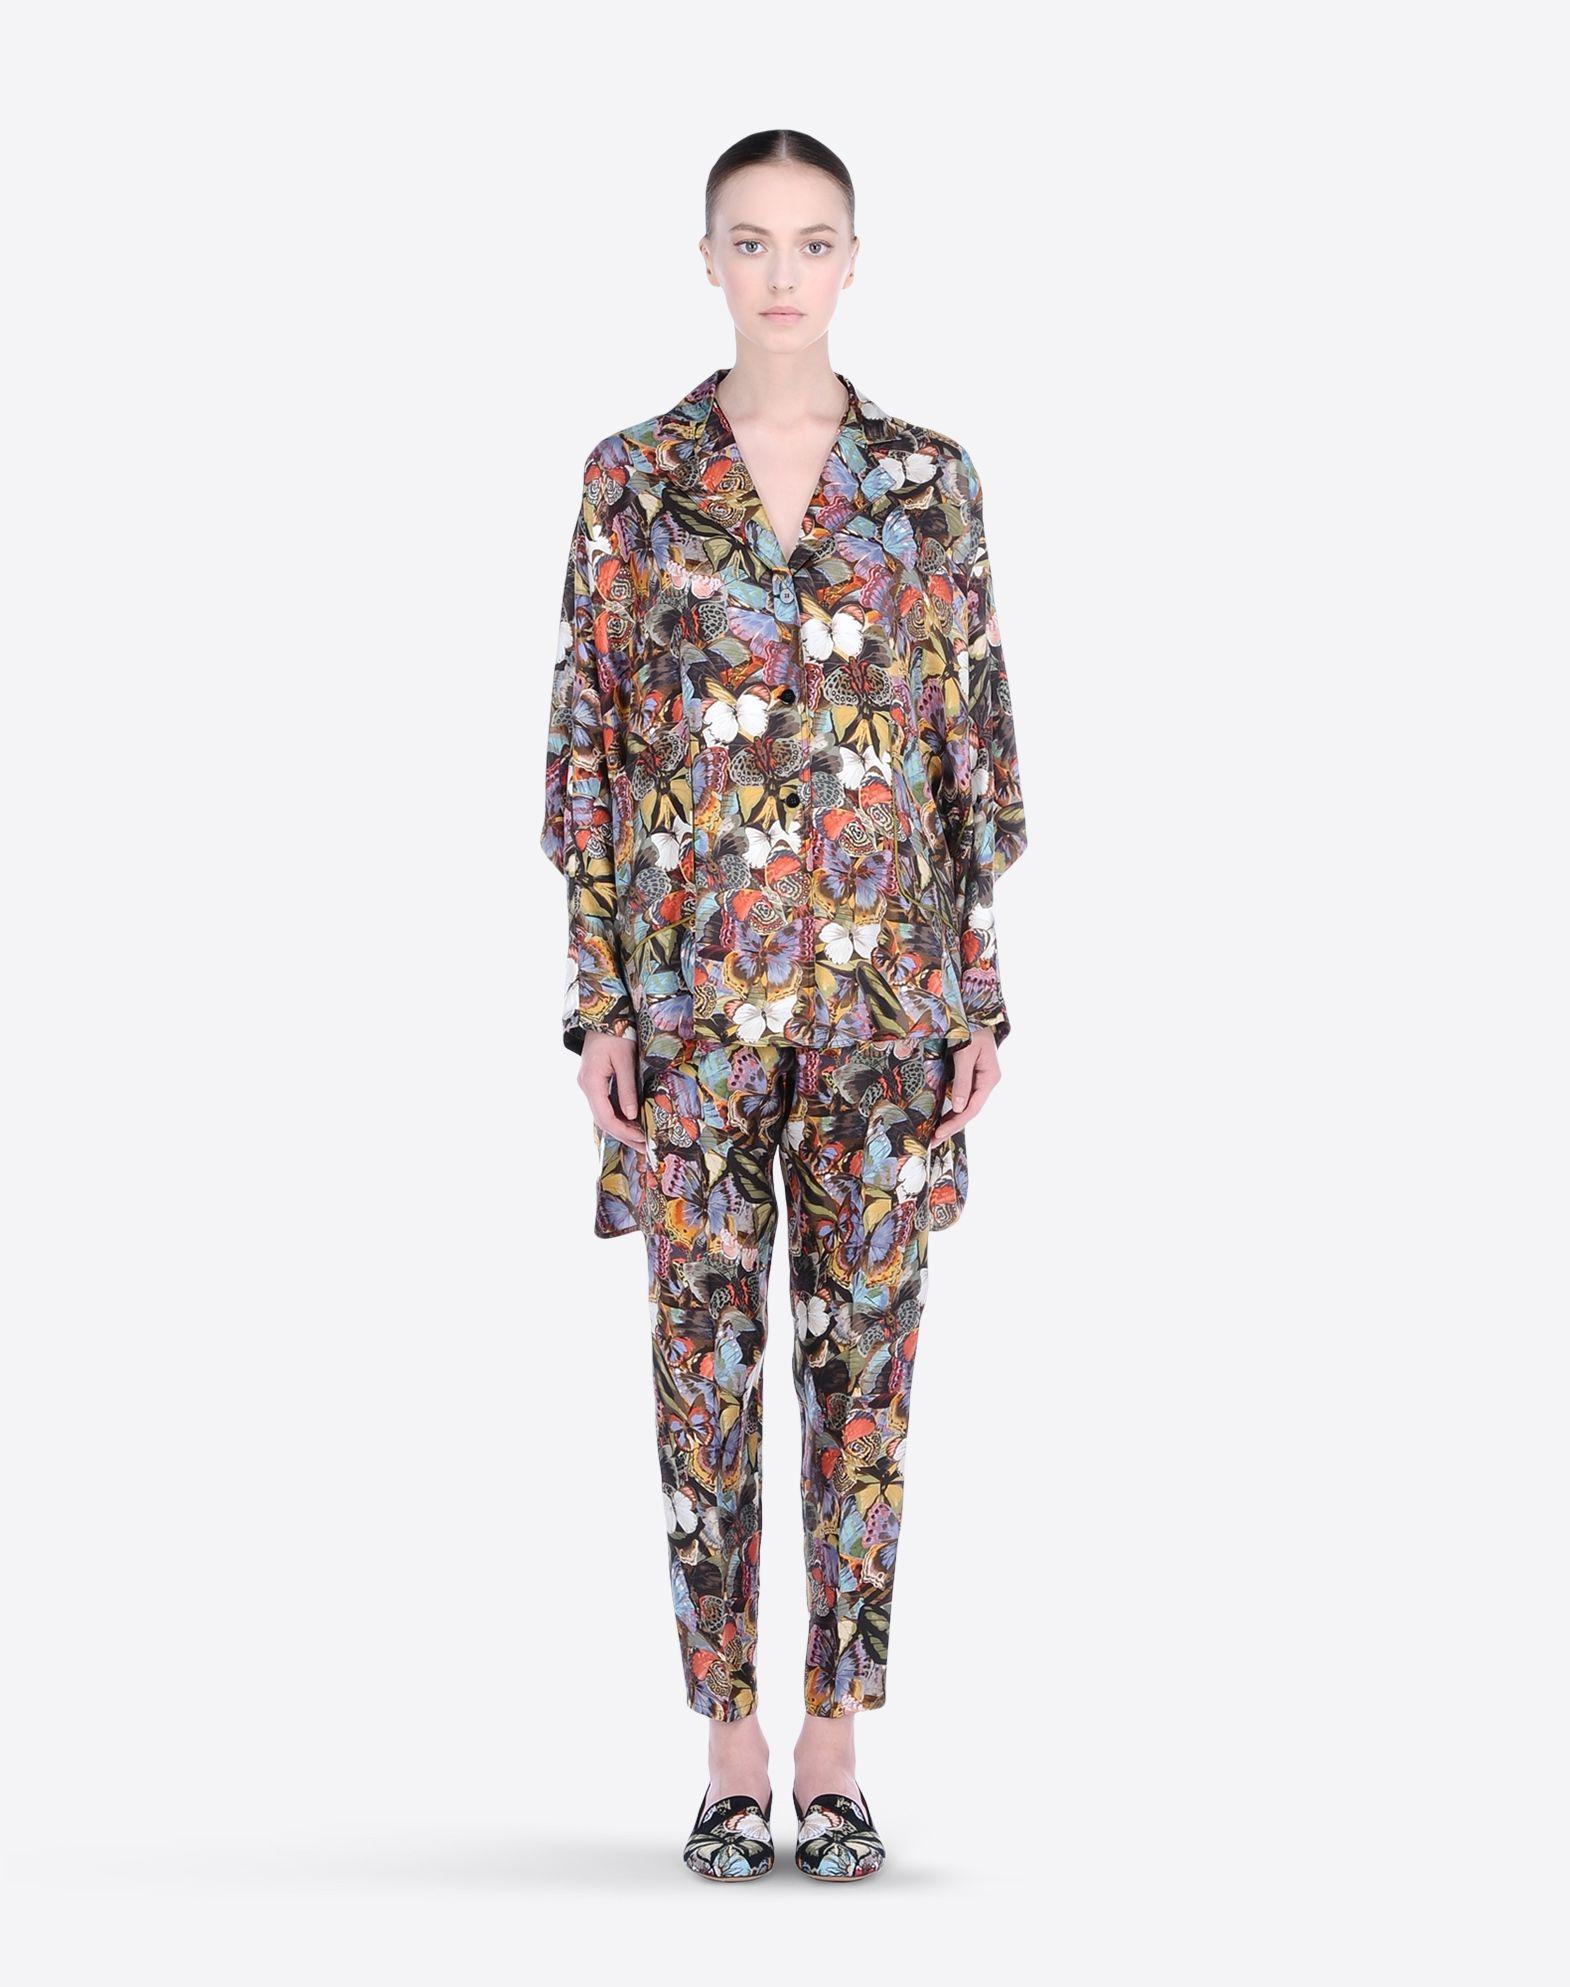 VALENTINO Drawstring closure Cotton twill Multicolor Pattern High waisted Three pockets  36552638xd